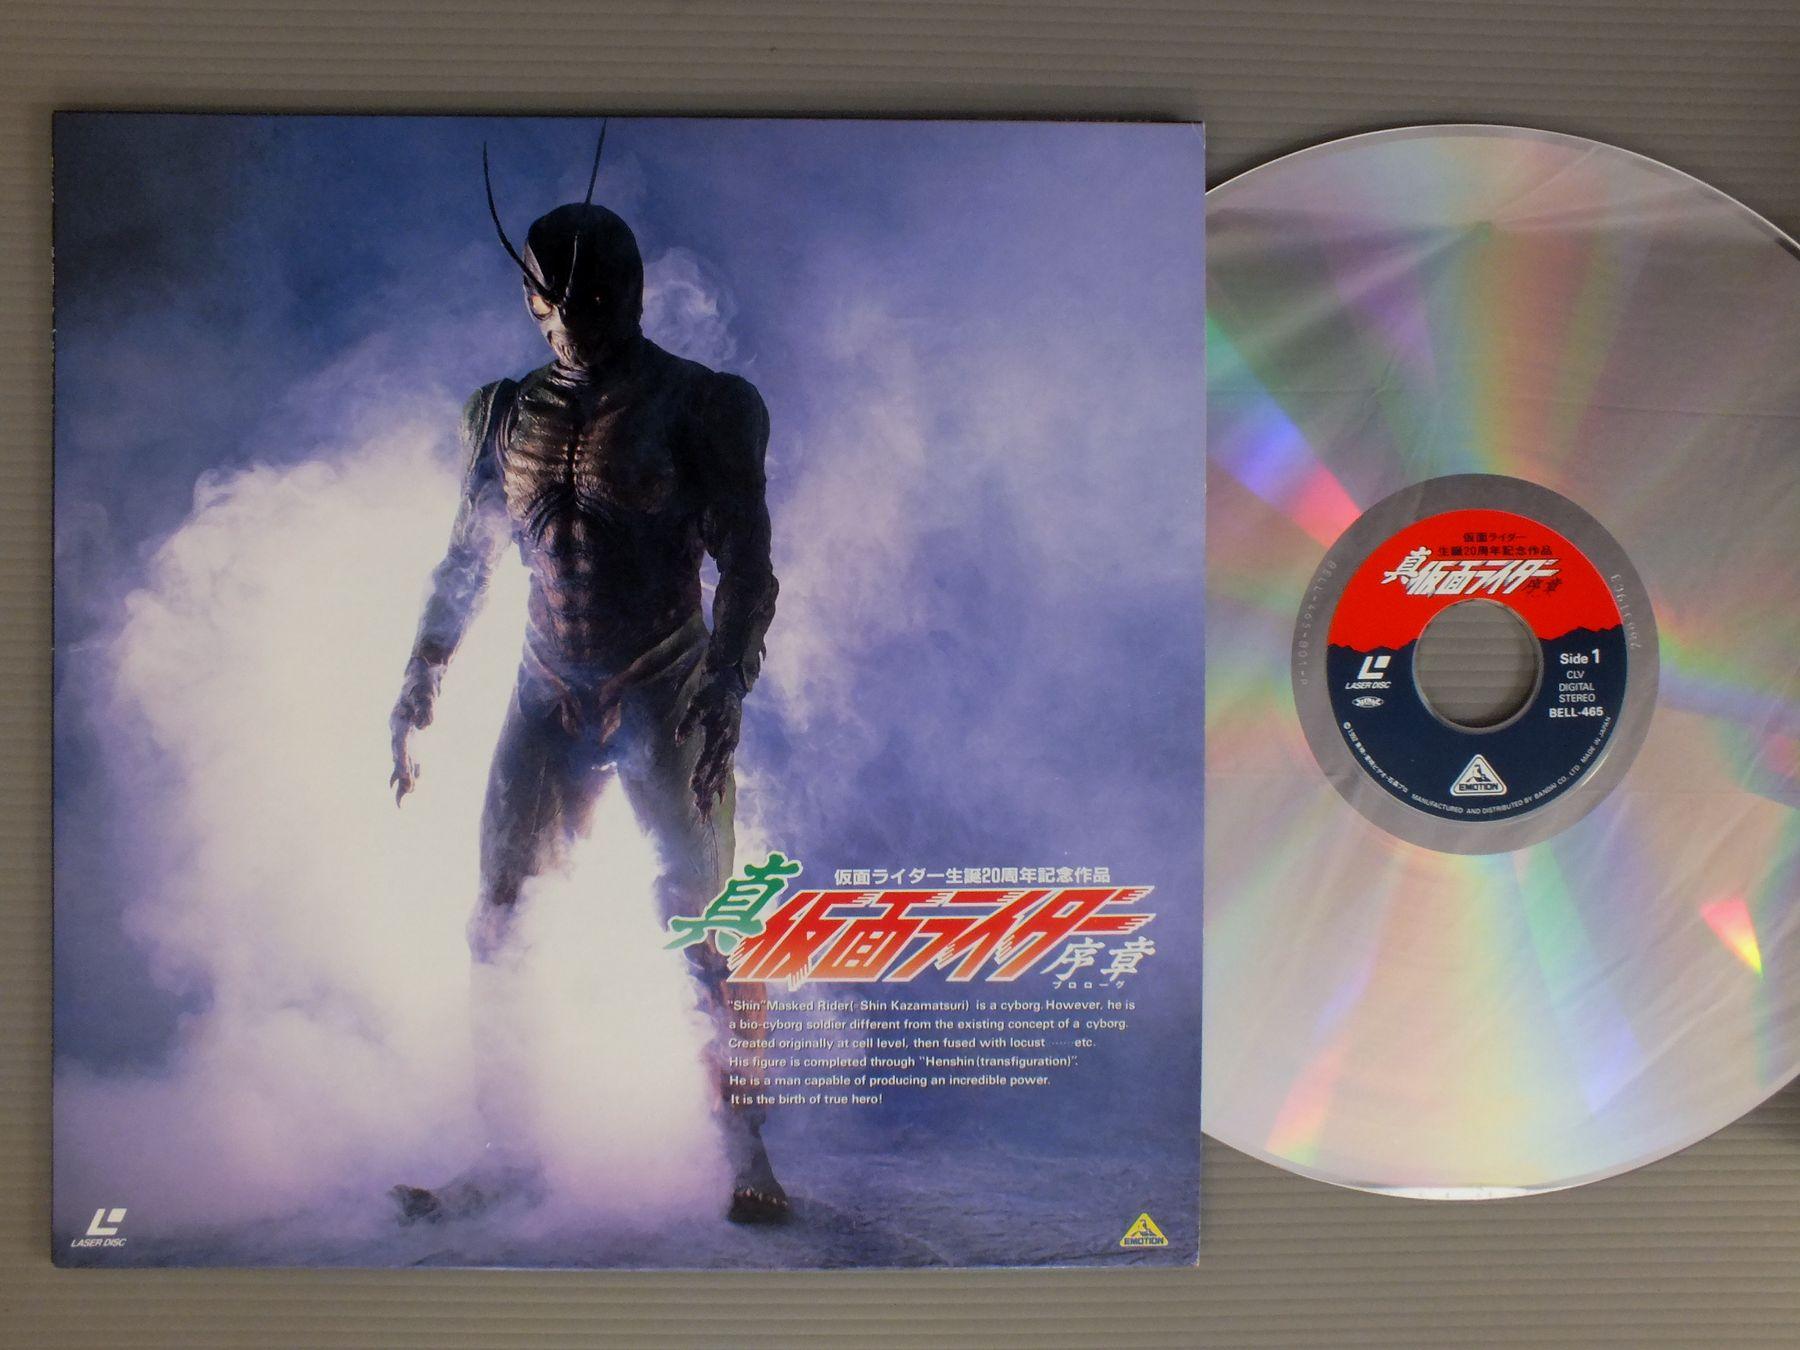 MASKED RIDER - SHIN MASKED RIDER PROLOGUE - Laser Disc